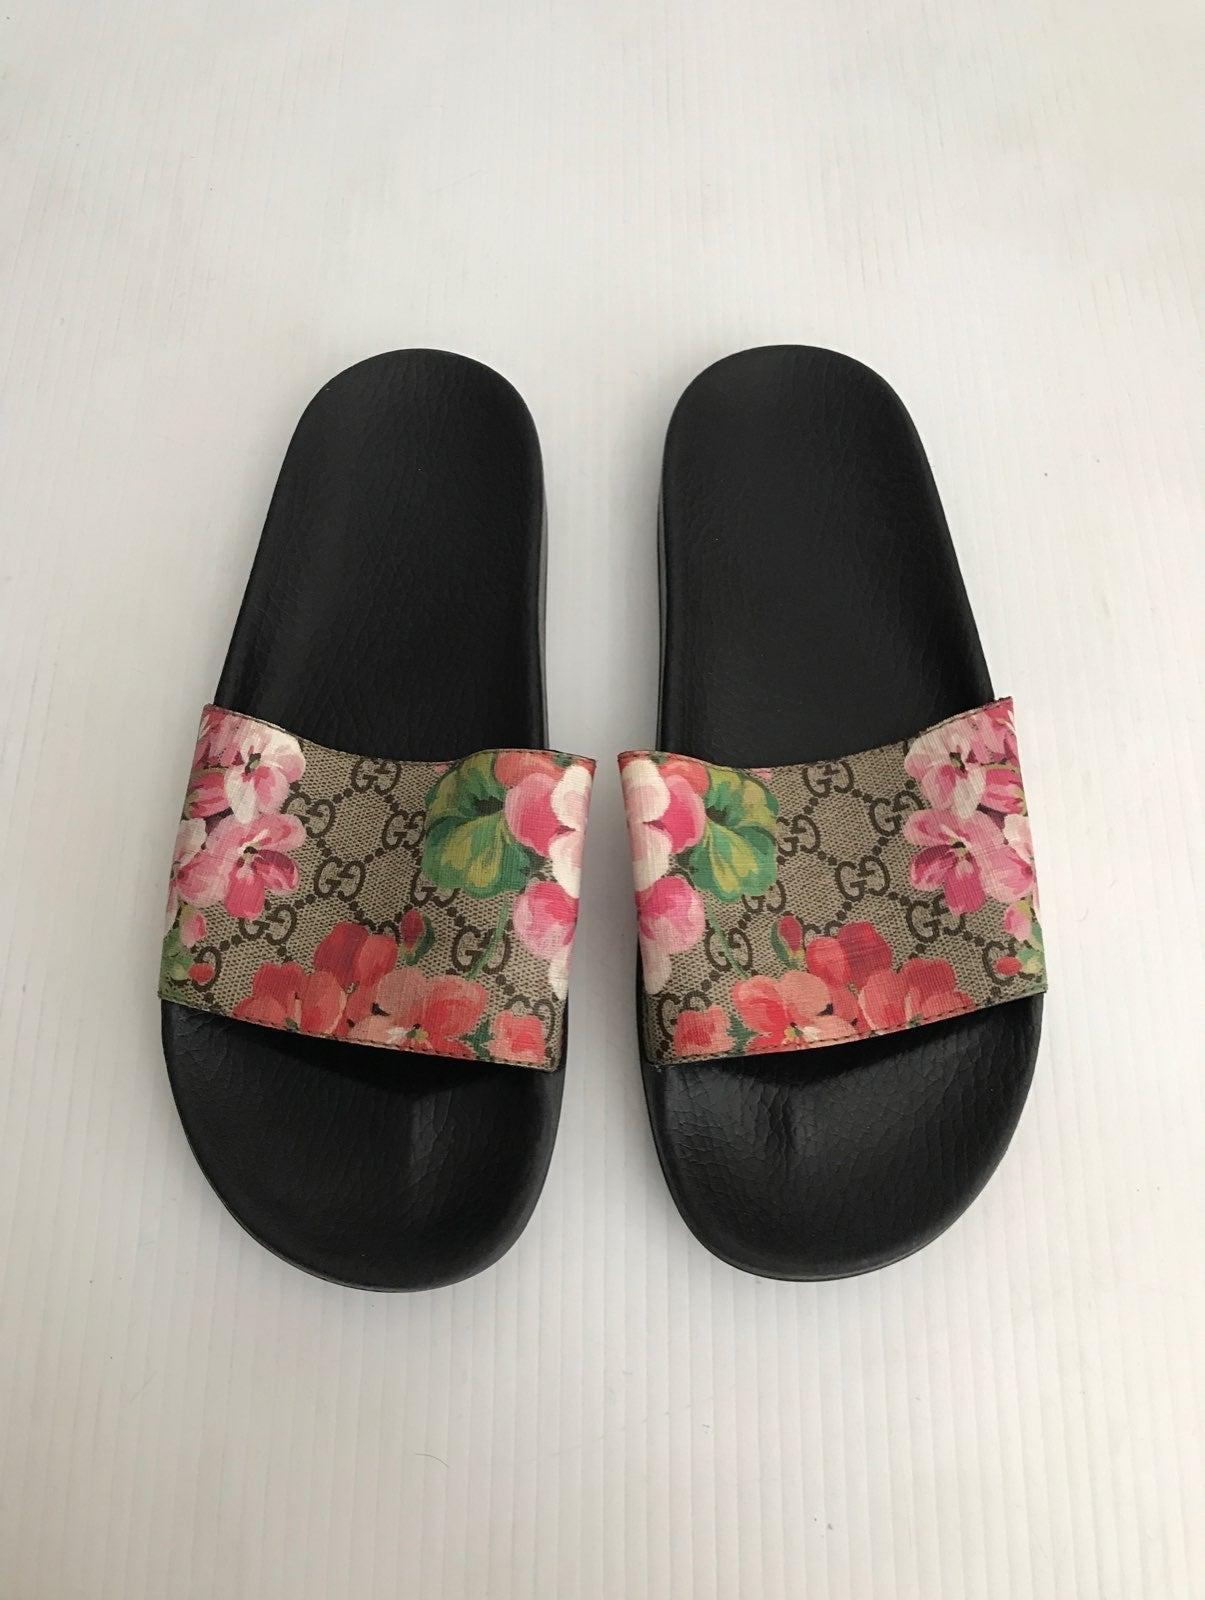 Gucci GG Bloom Pursuit Slide Sandal 41